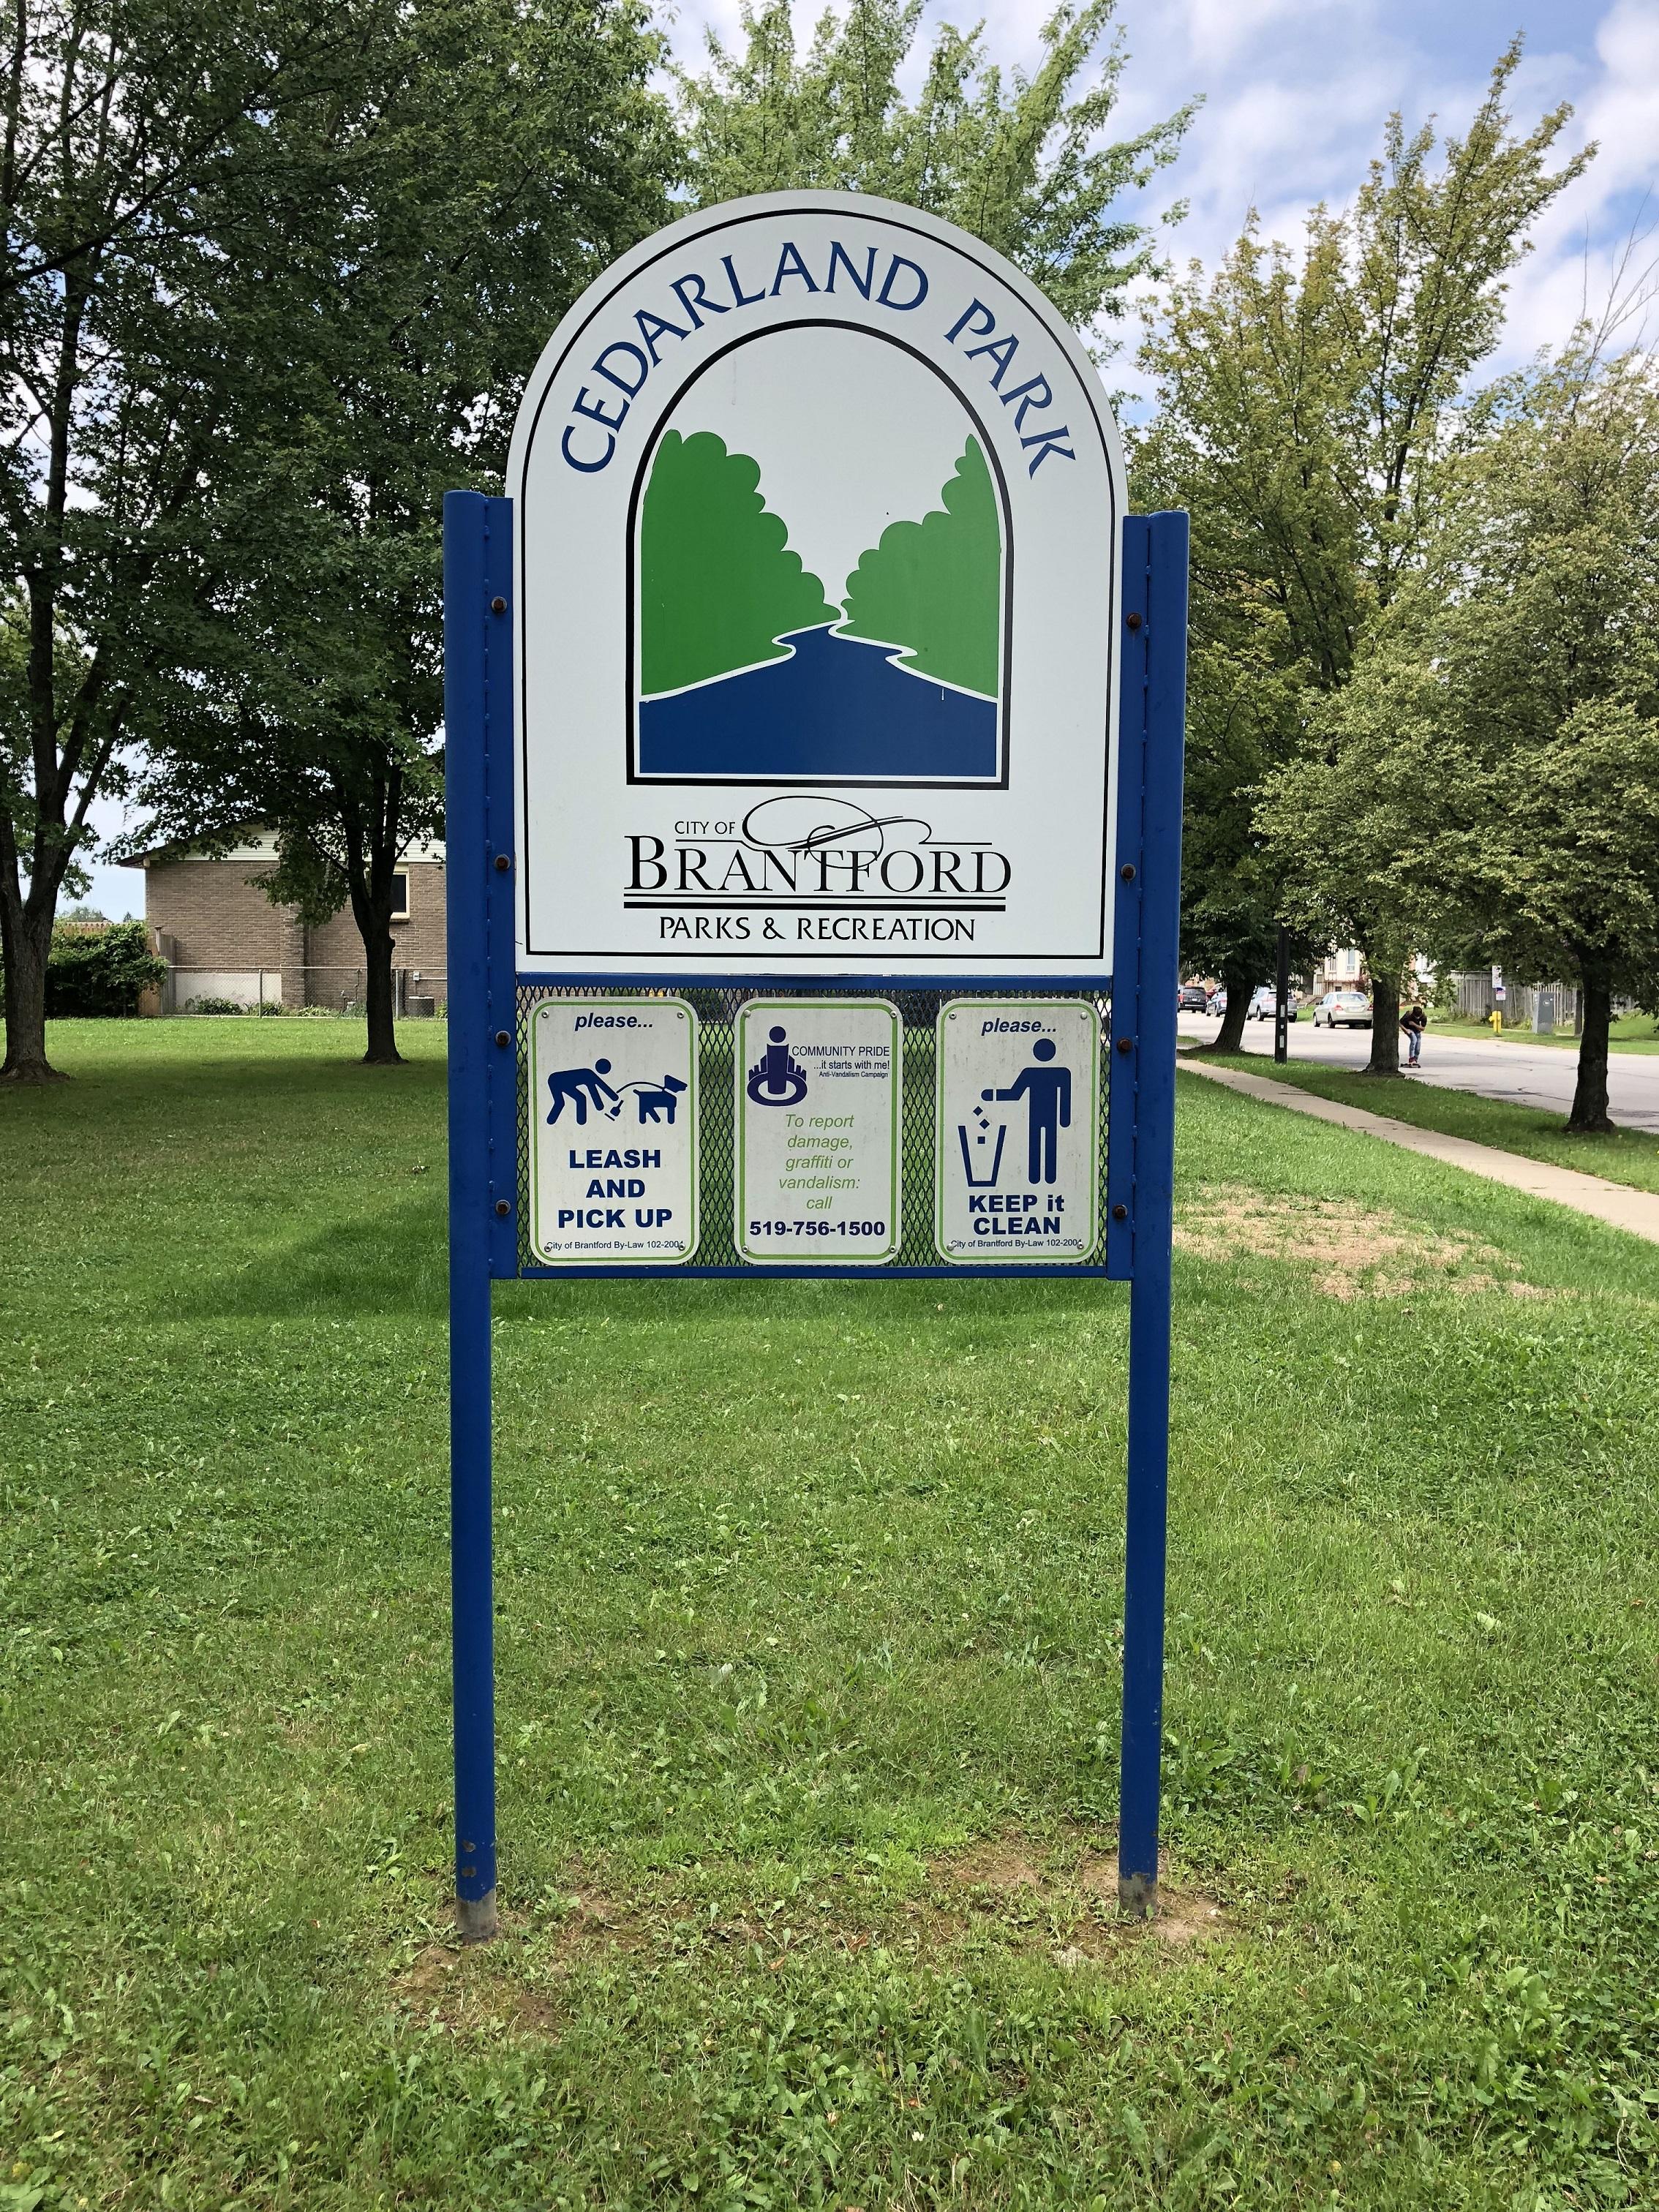 29-08-2018 Cedarland (1)resize.jpg